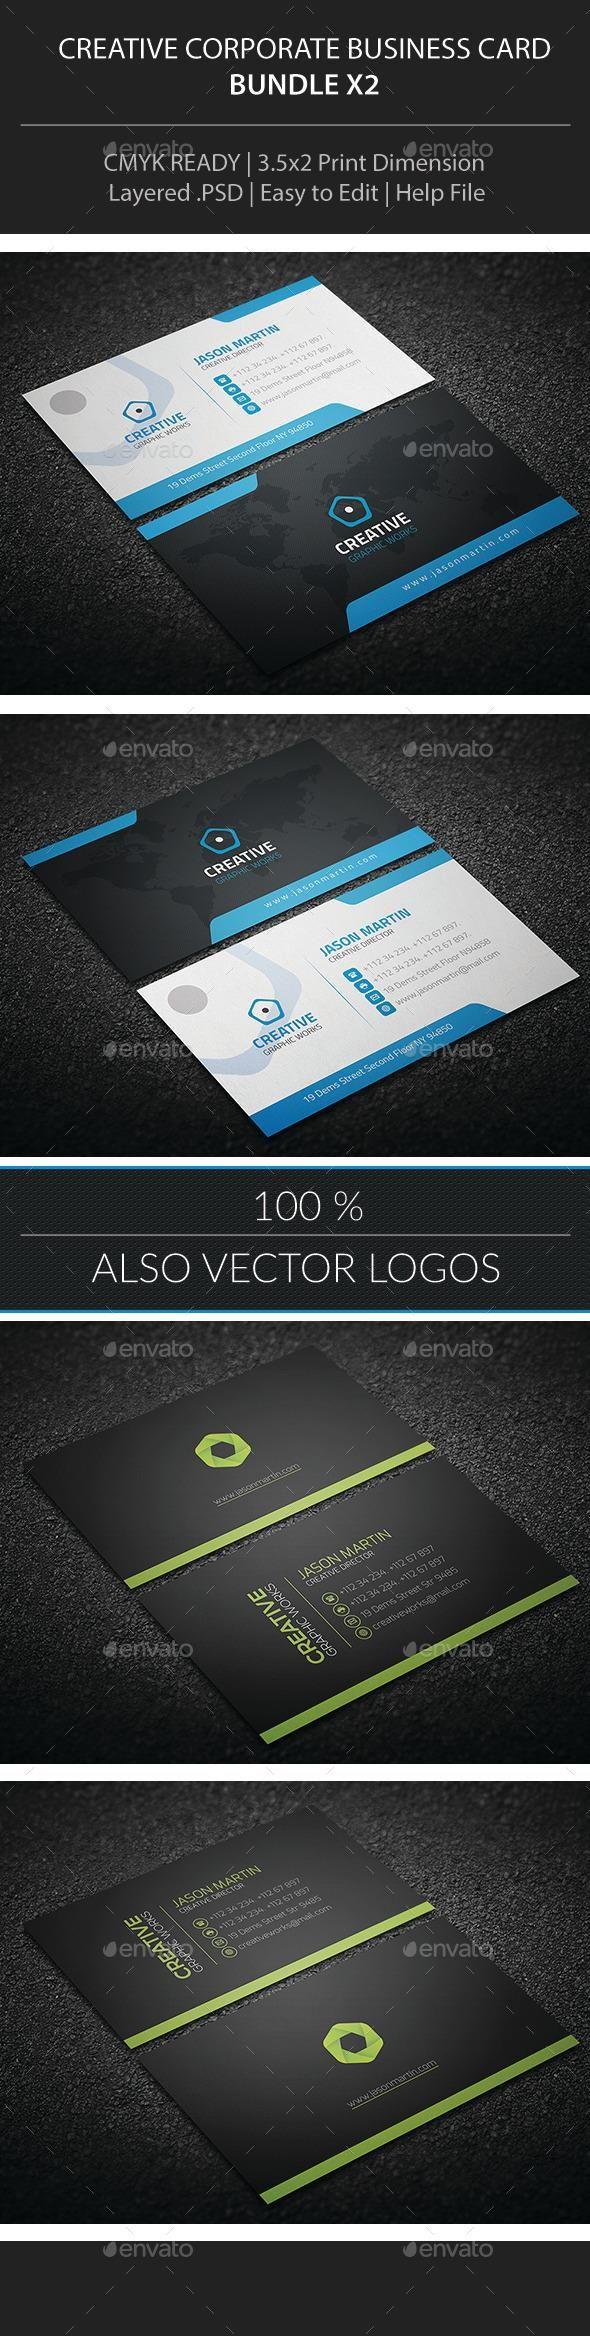 363 best Business Card Design images on Pinterest   Business card ...